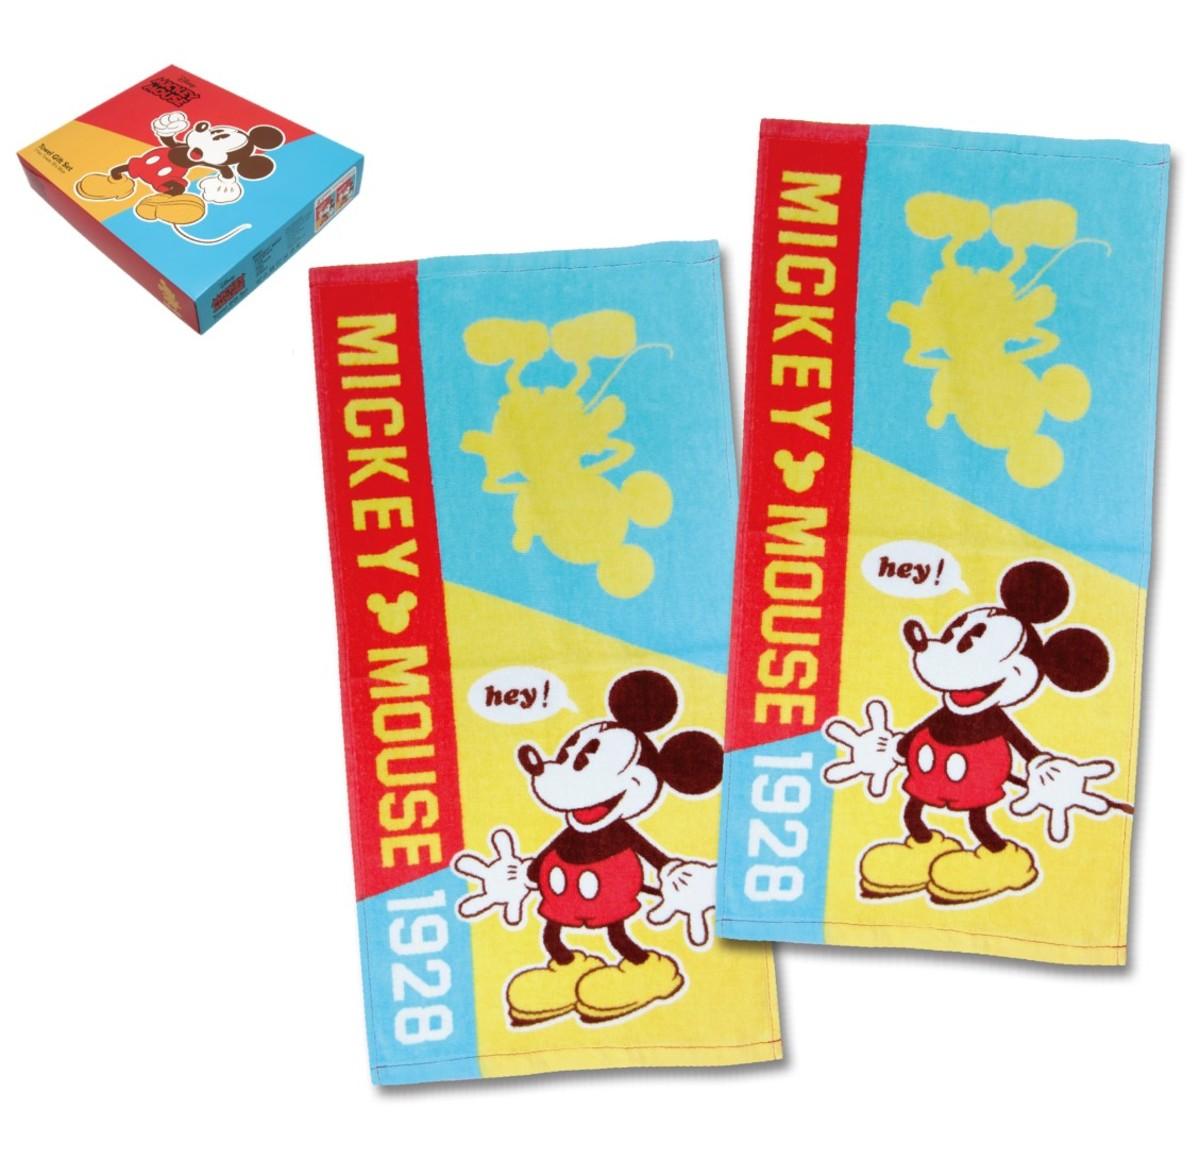 Disney迪士尼 --2P長巾套裝(限定版) (迪士尼許可產品)